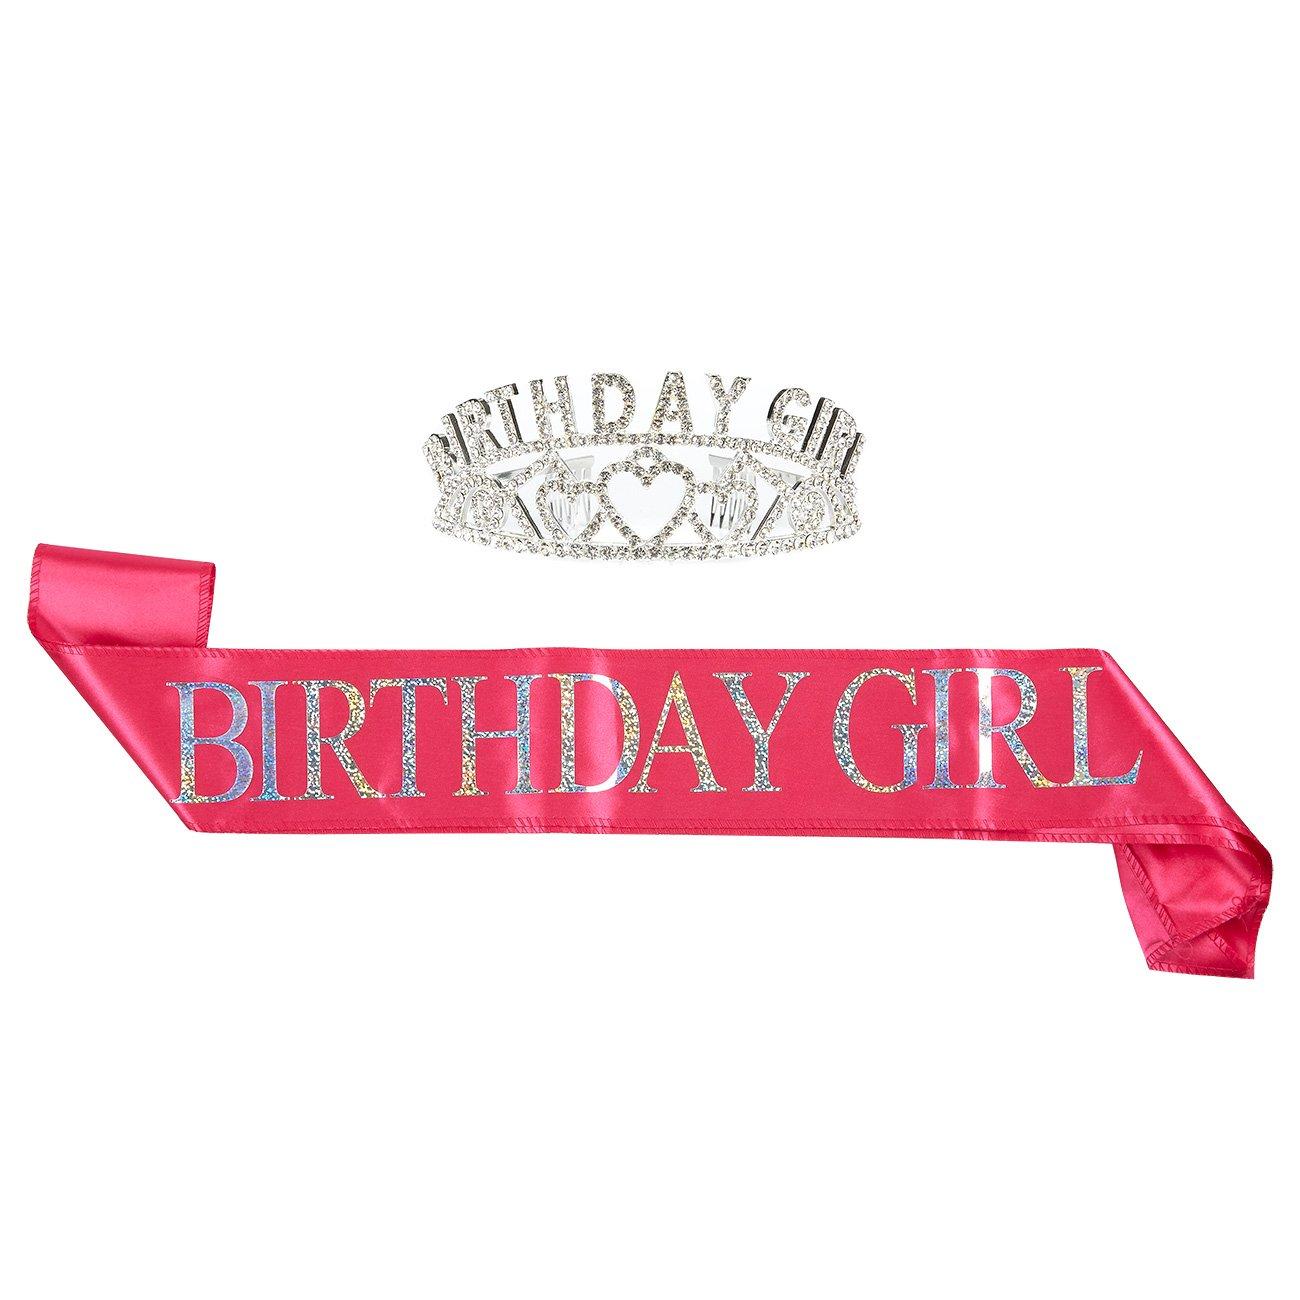 Blue Panda 2-Pack Set Birthday Girl Tiara Birthday Sash - Rhinestone Crown Birthday Girl Polyester Sash Decoration 16th, 18th, 21st 30th Birthdays Quinceaneras